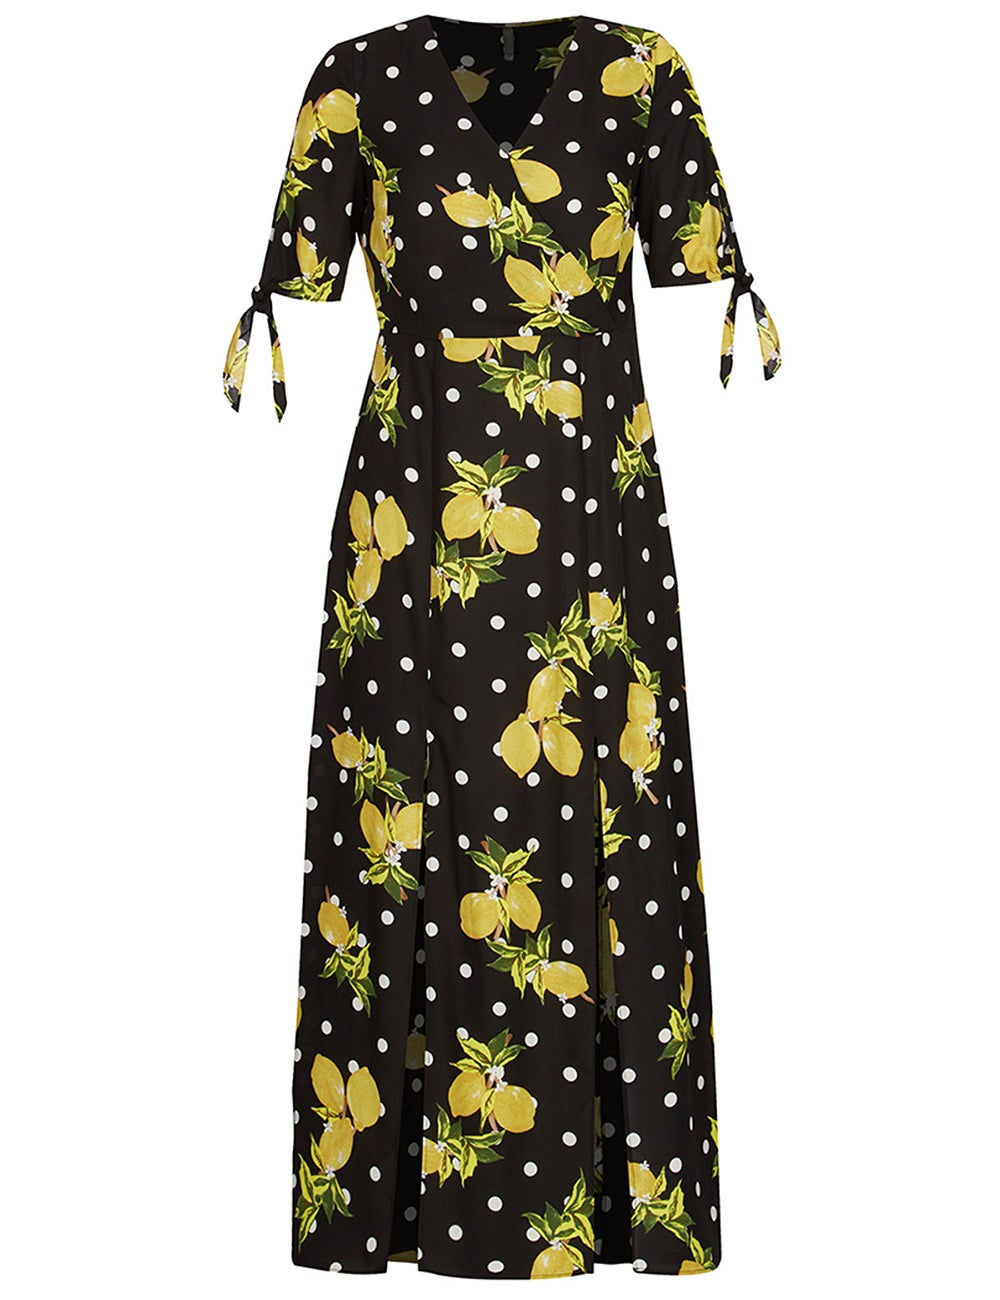 Crossroads Lemon Maxi Dress Front Leg Splits Short Sleeves With Ties Size 16